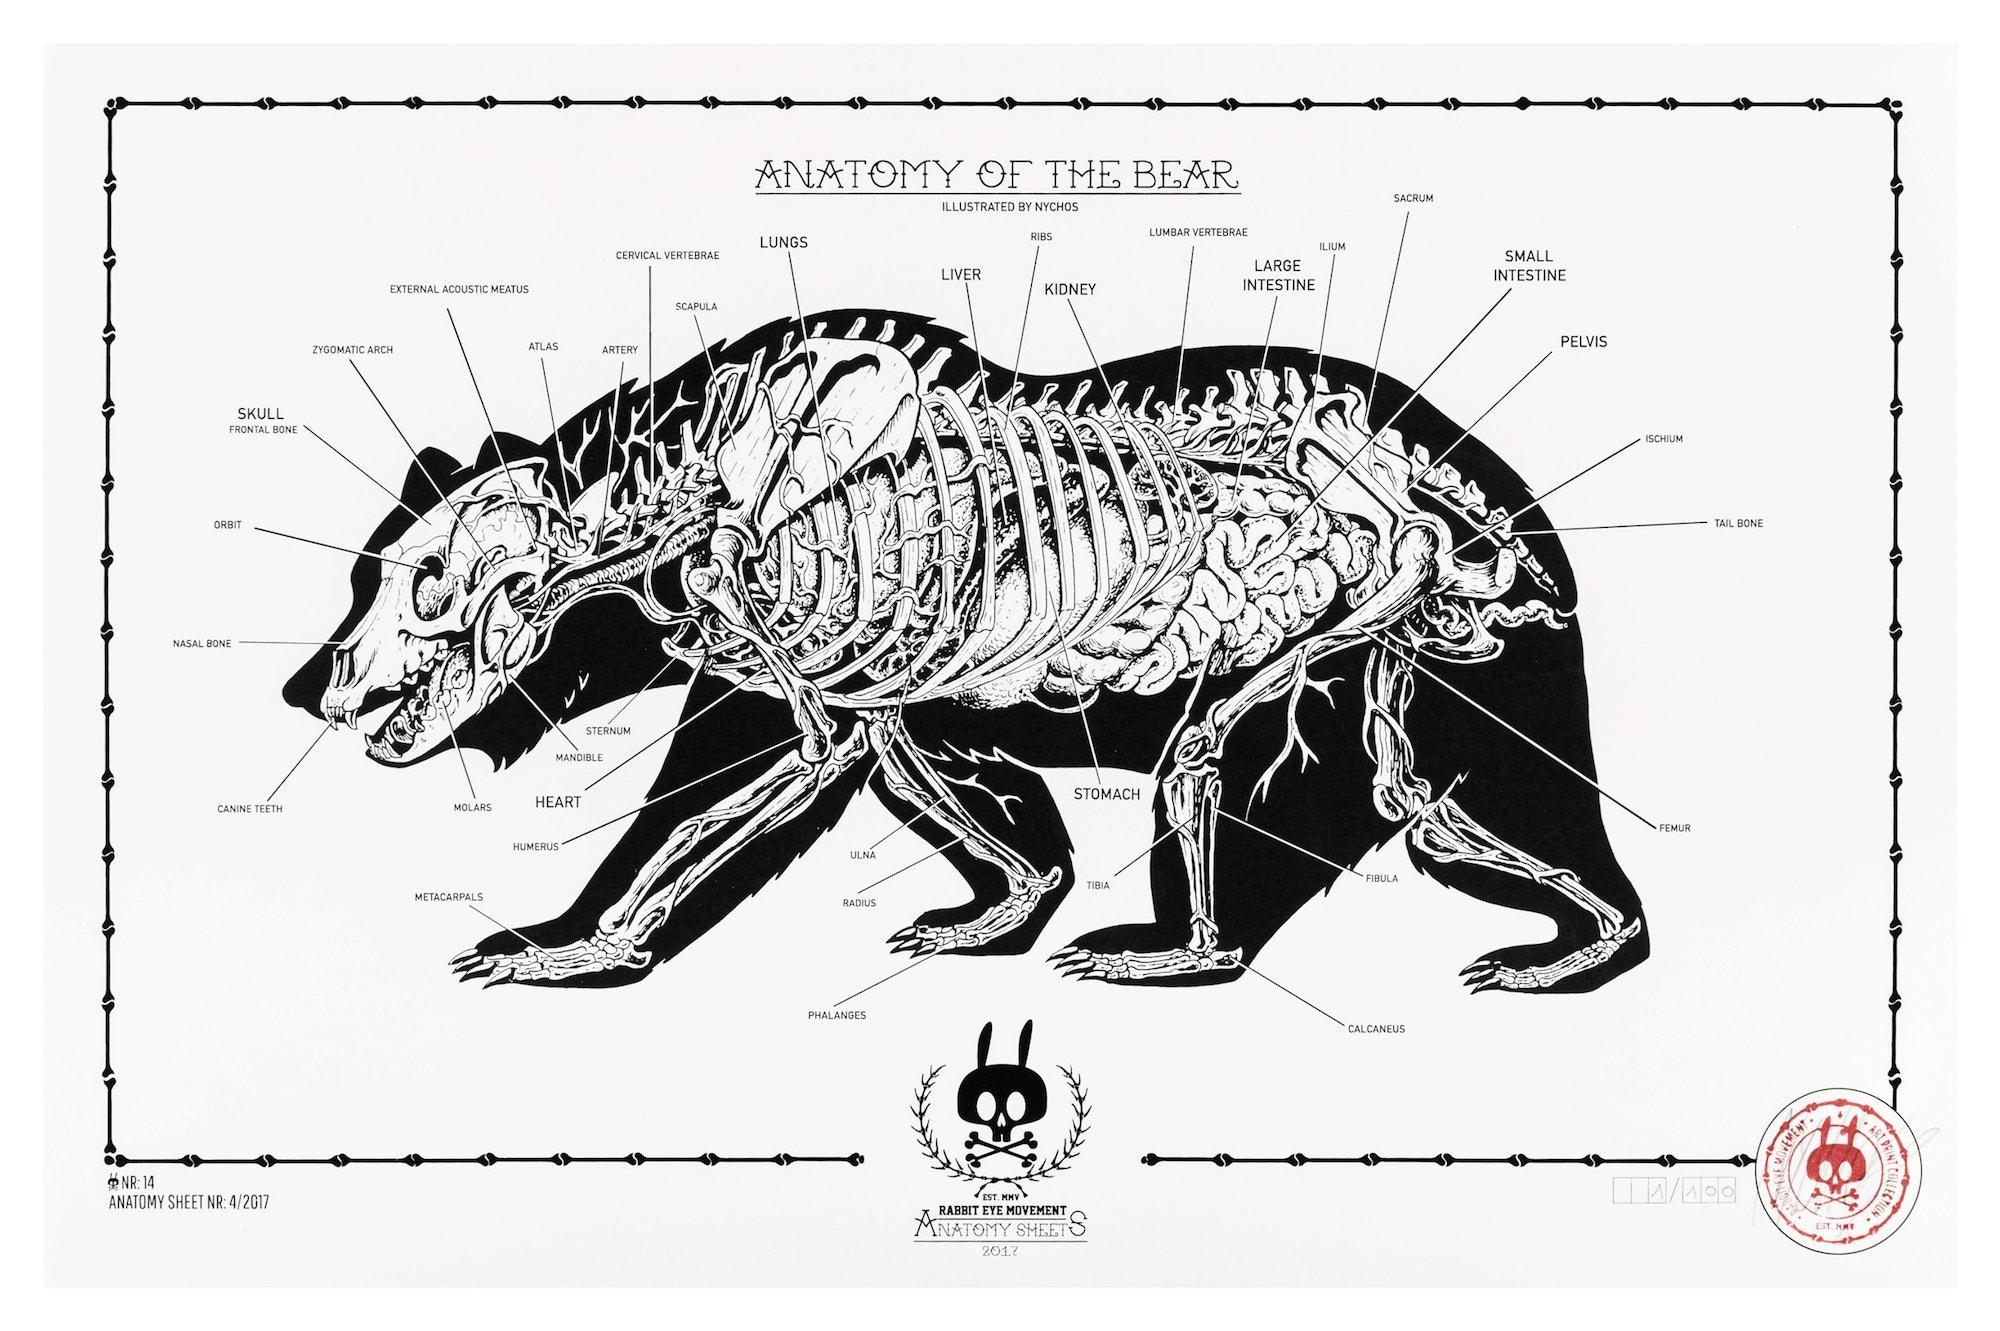 rabbit skeleton diagram ford hei distributor wiring anatomy of the bear: sheet no.14 - eye movement inc.